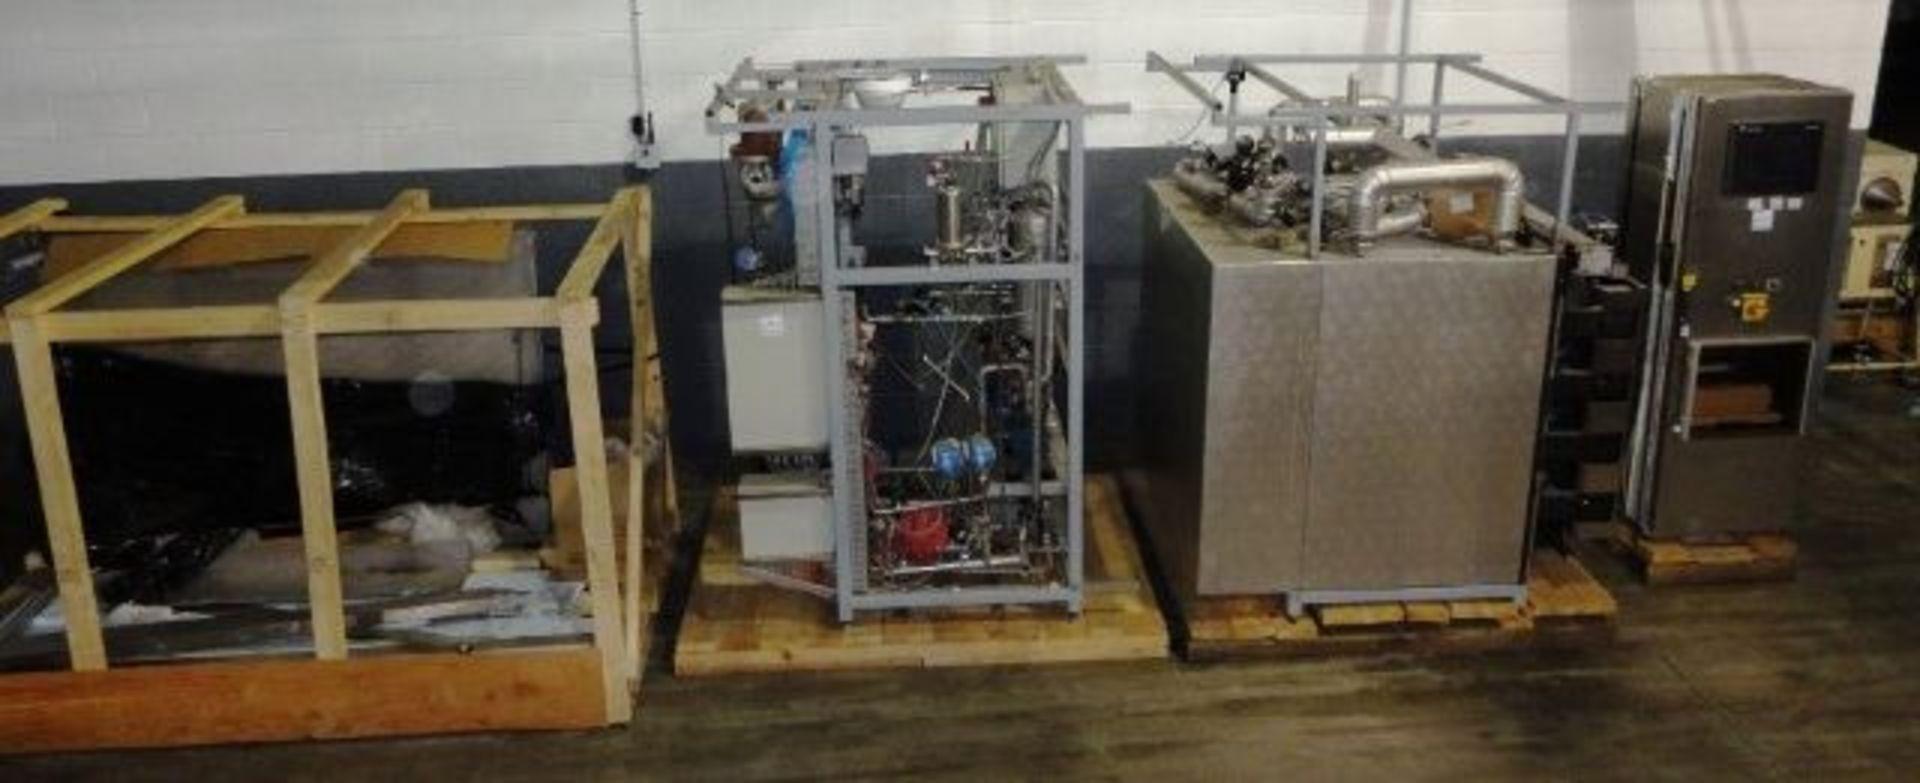 Lot 56 - Steris Finn Aqua sterilizer autoclave, model 9912-B-GMP, stainless steel contact surfaces,